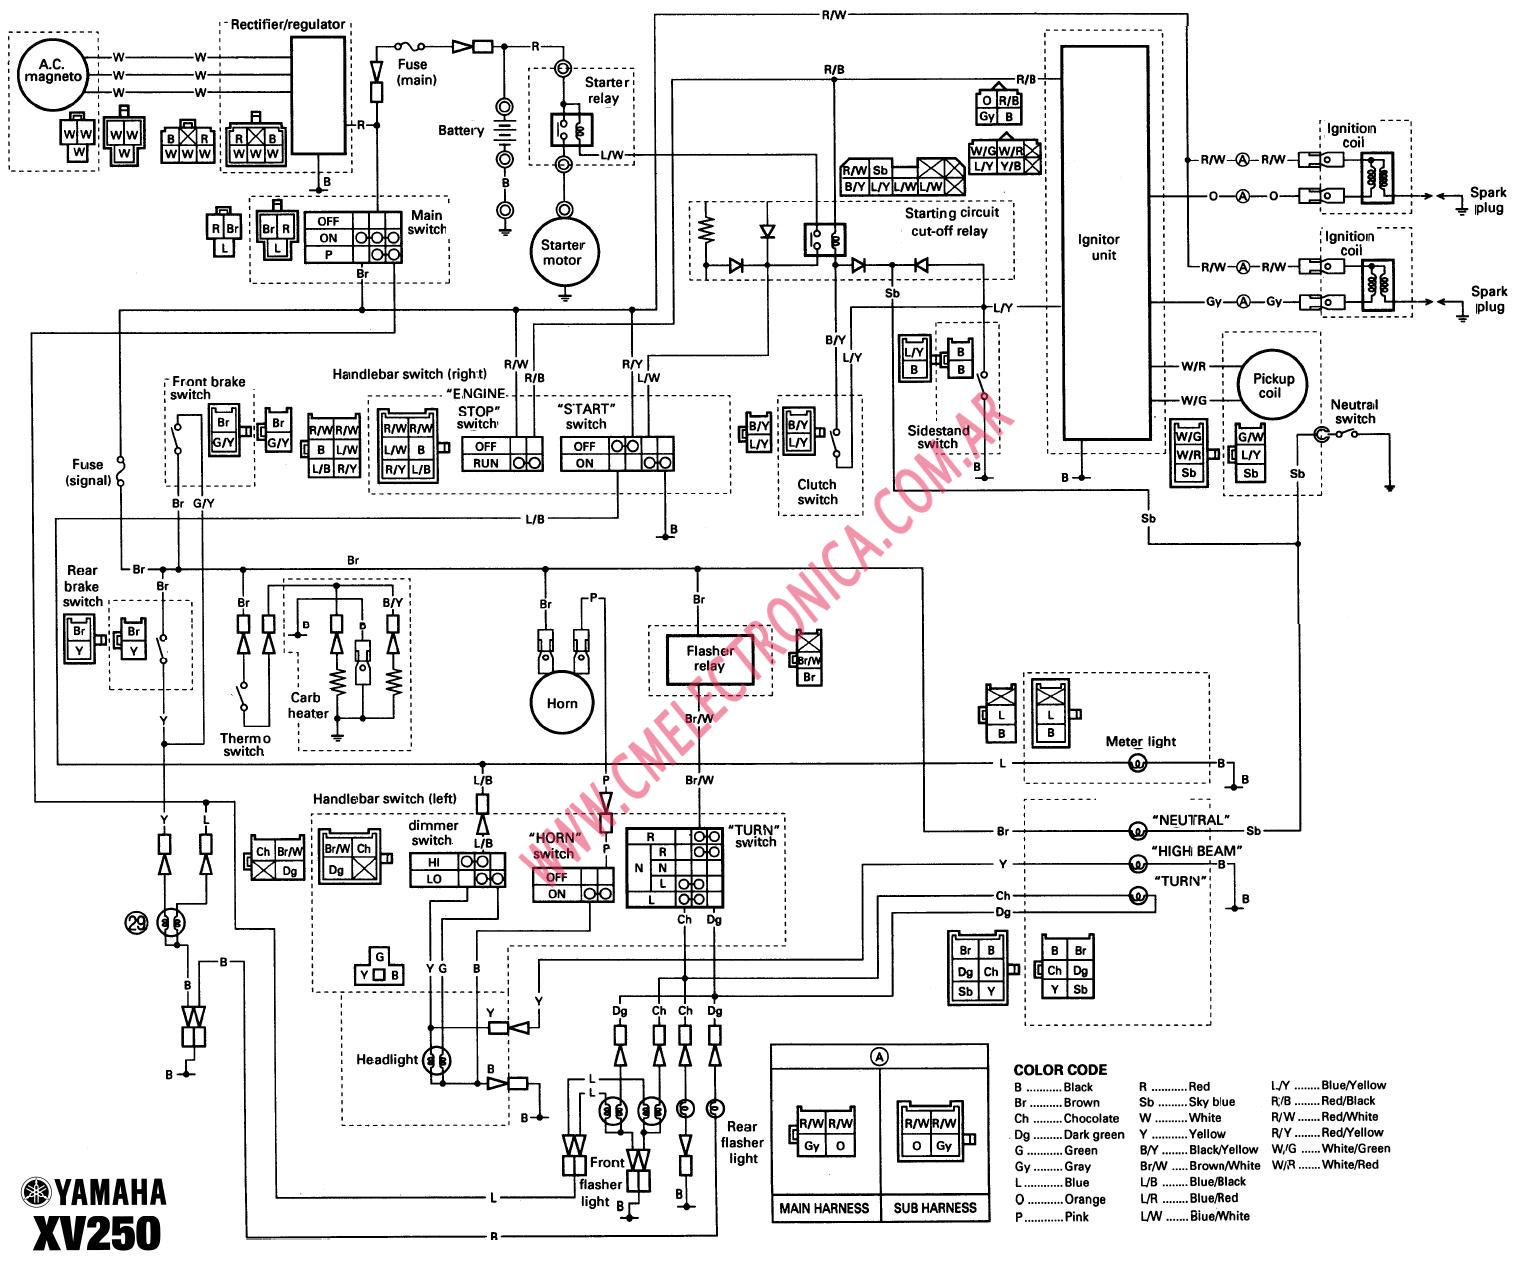 wiring diagram de taller citroen c5